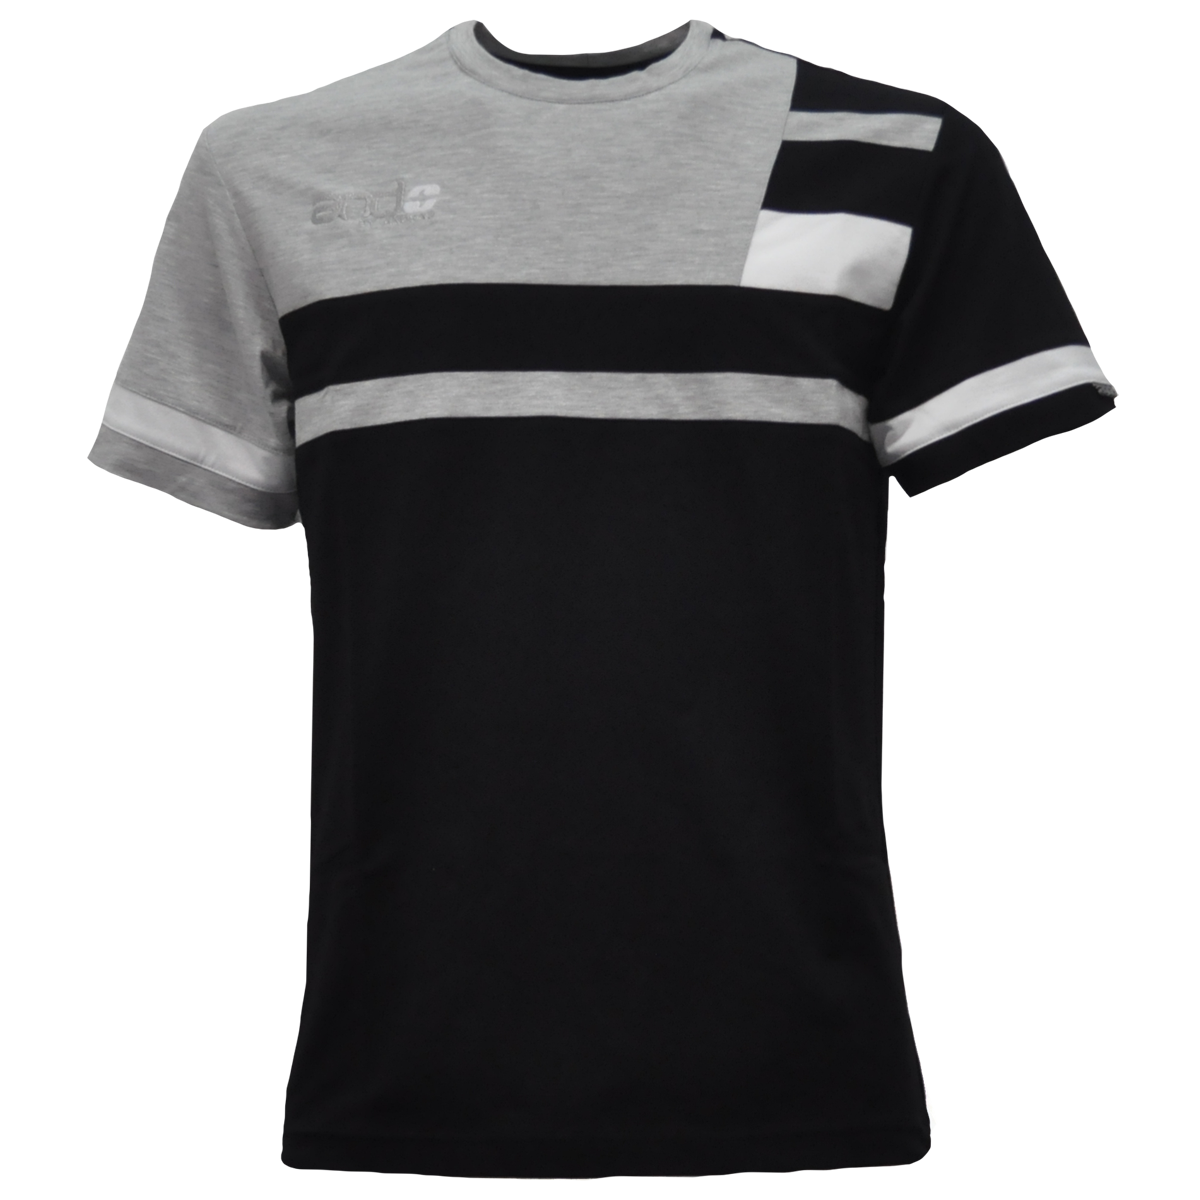 Gino_-_moska_-_bombazna_-_T_shirt_-_majica_-_13.png